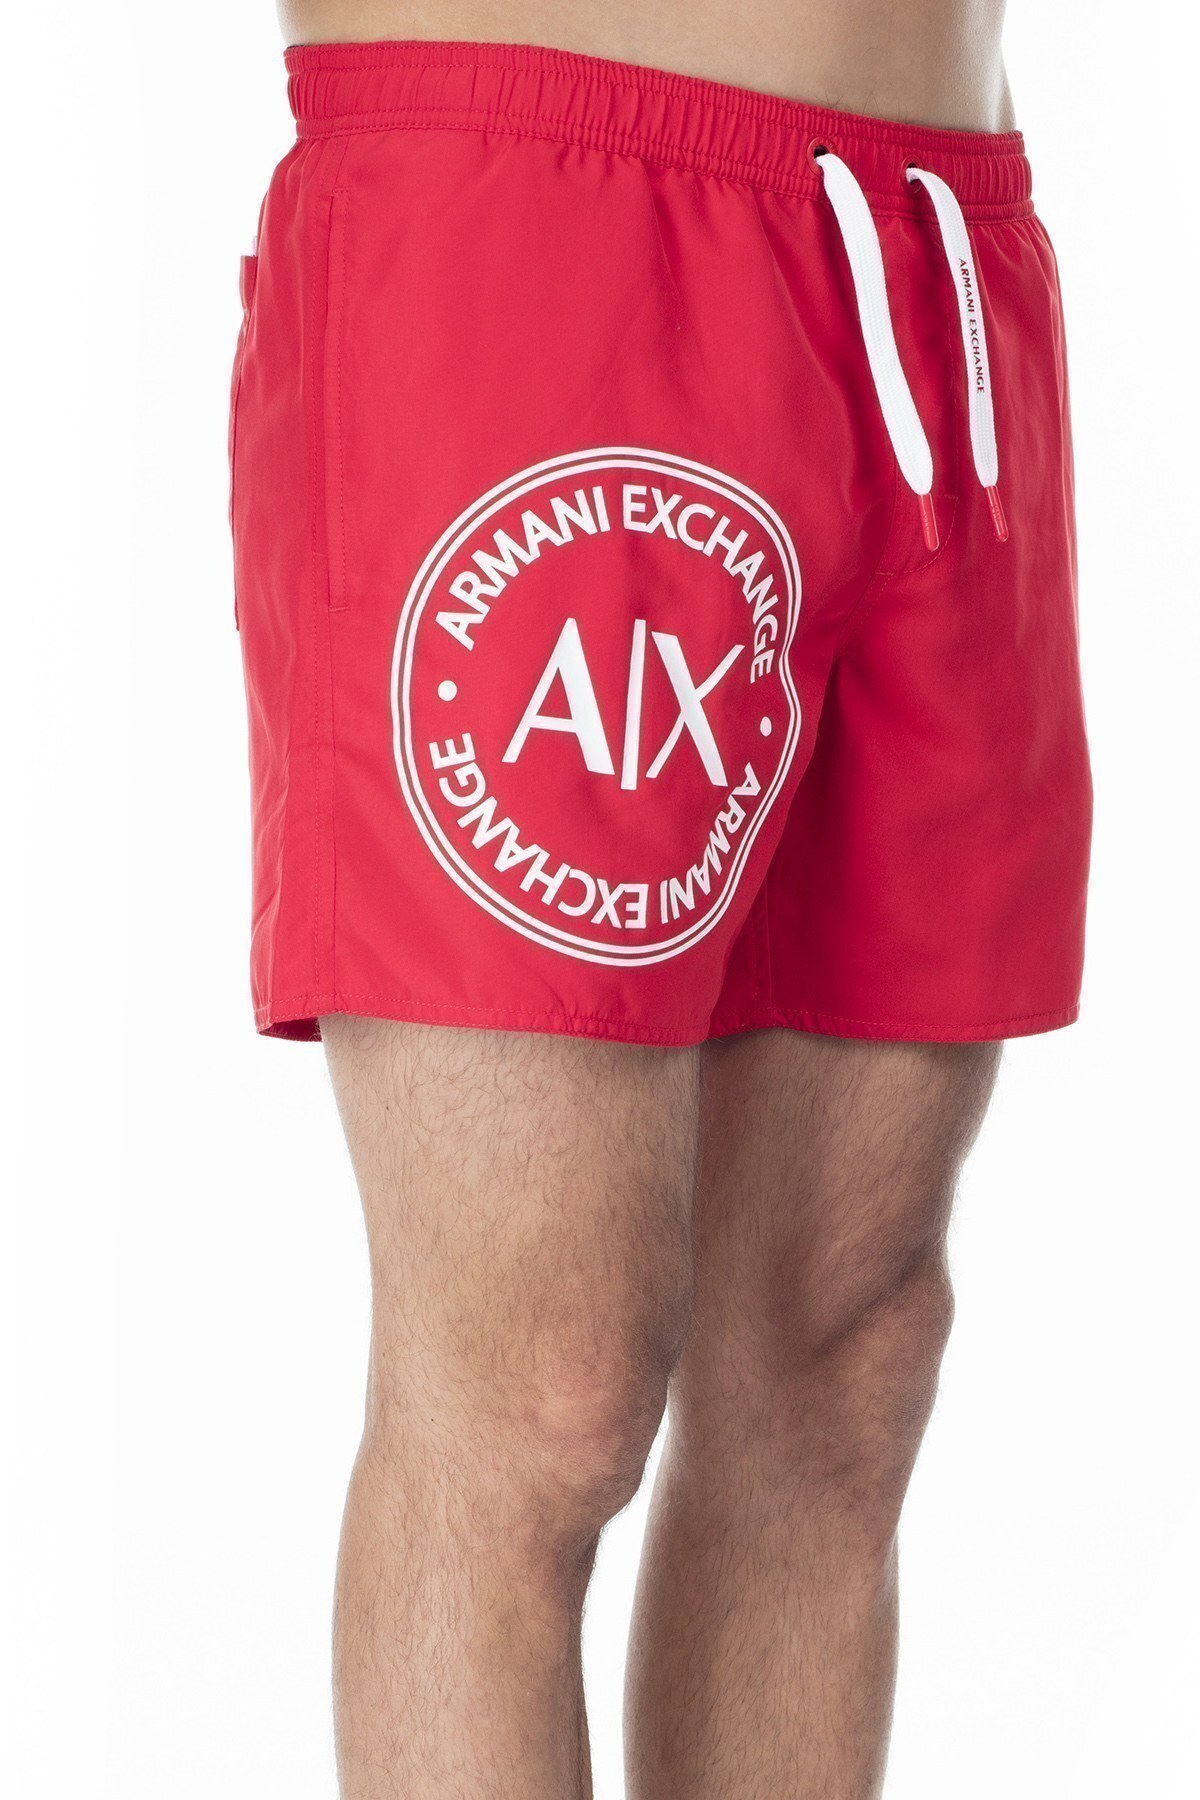 Armani Exchange Erkek Mayo Short 953001 0P620 18775 KIRMIZI